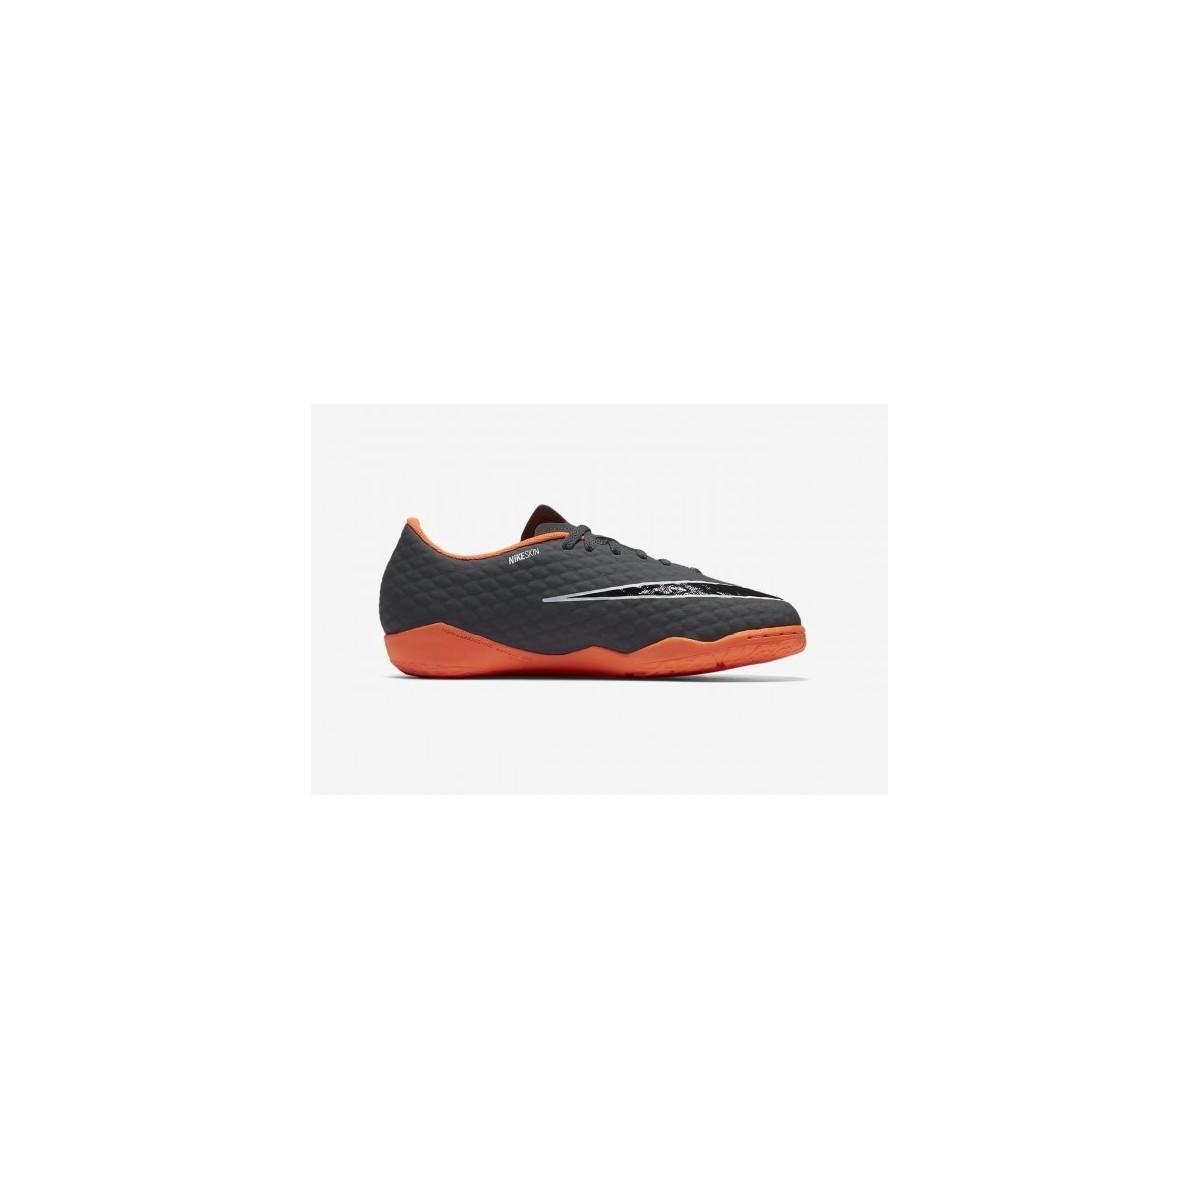 0f9b139dbdb Nike Hypervenom Phantomx Academy 3 Zapatillas Niño Fútbol Sala AH7295 081  Grises